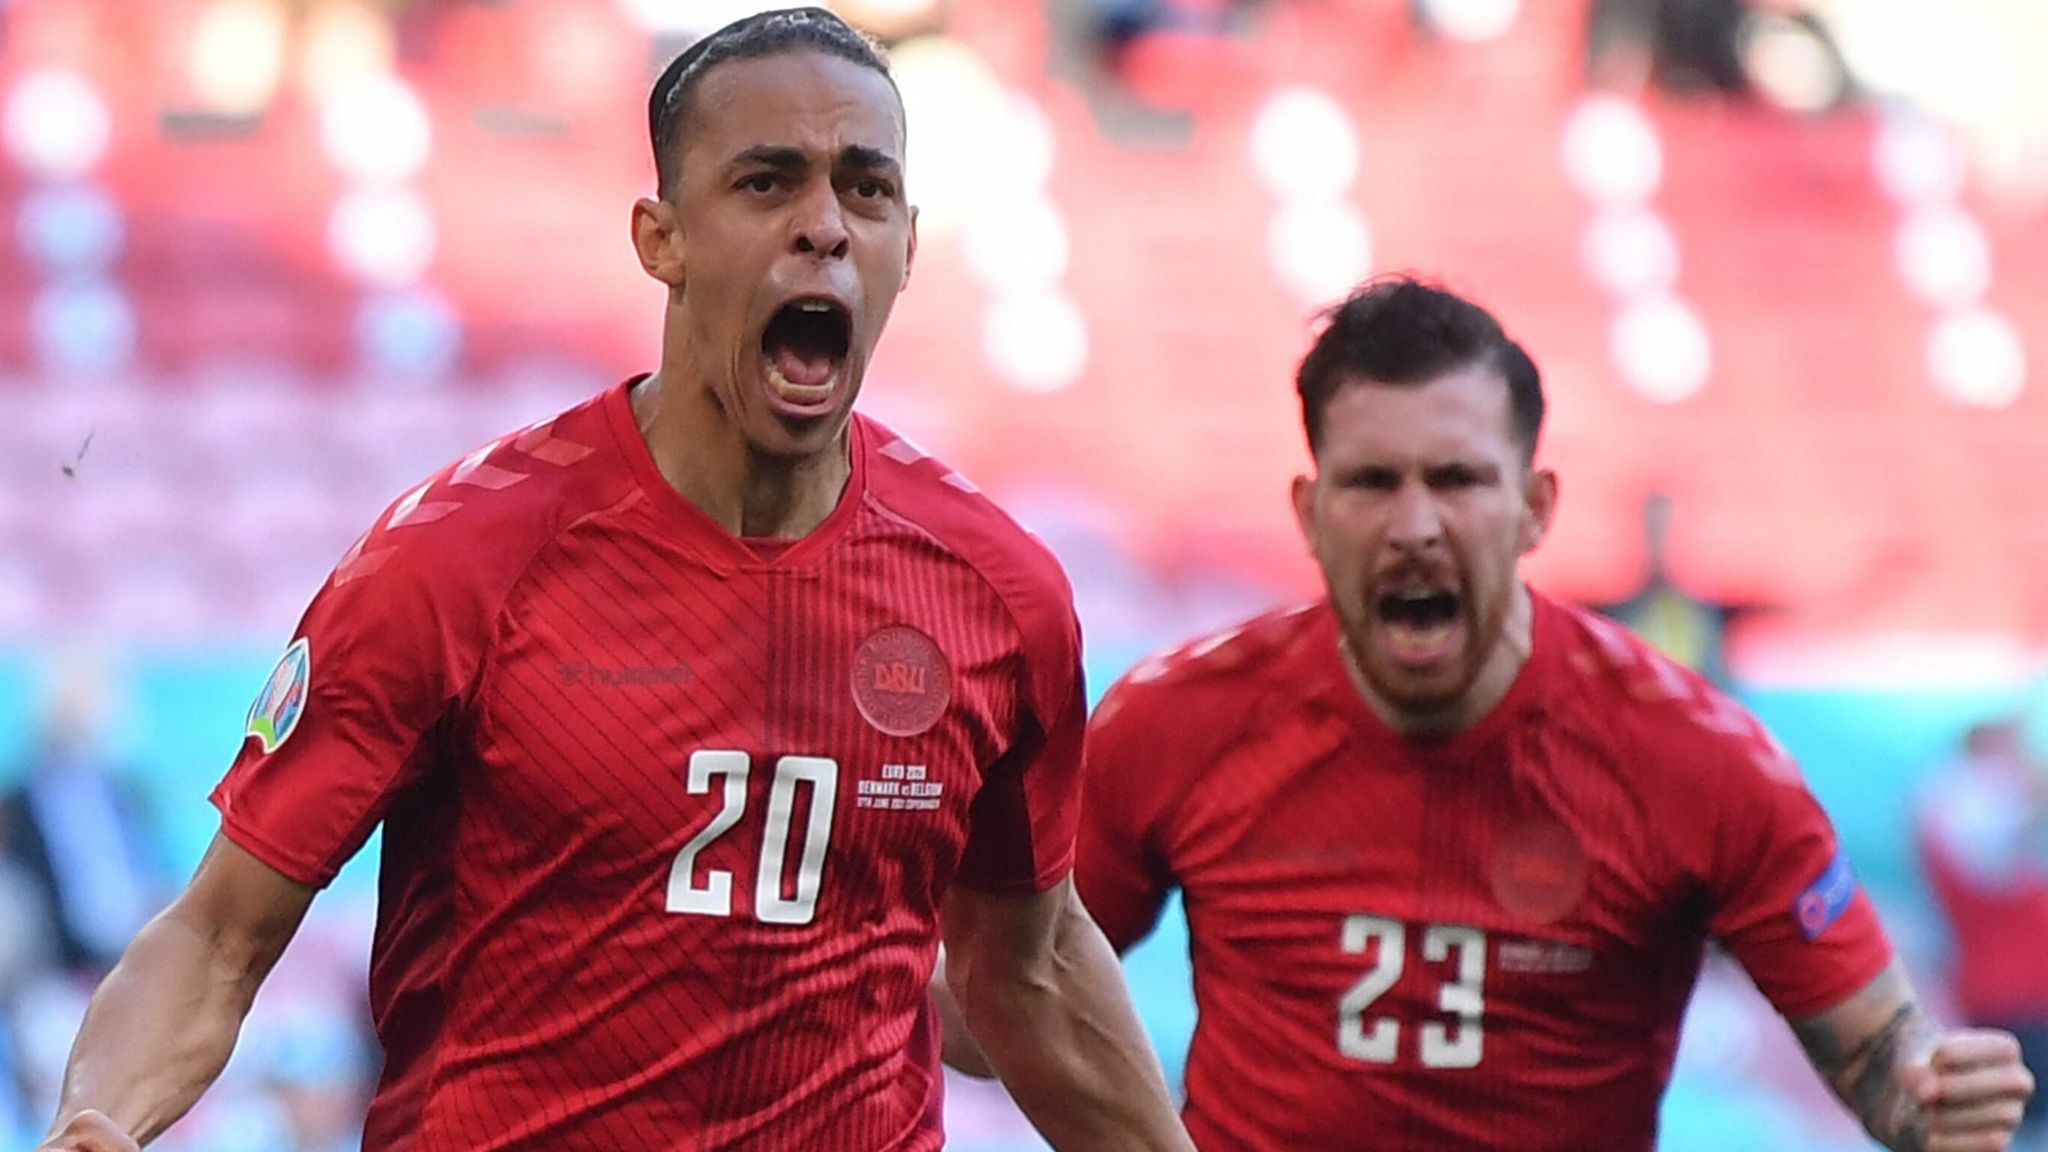 Denmark aim for maximum points against Russia